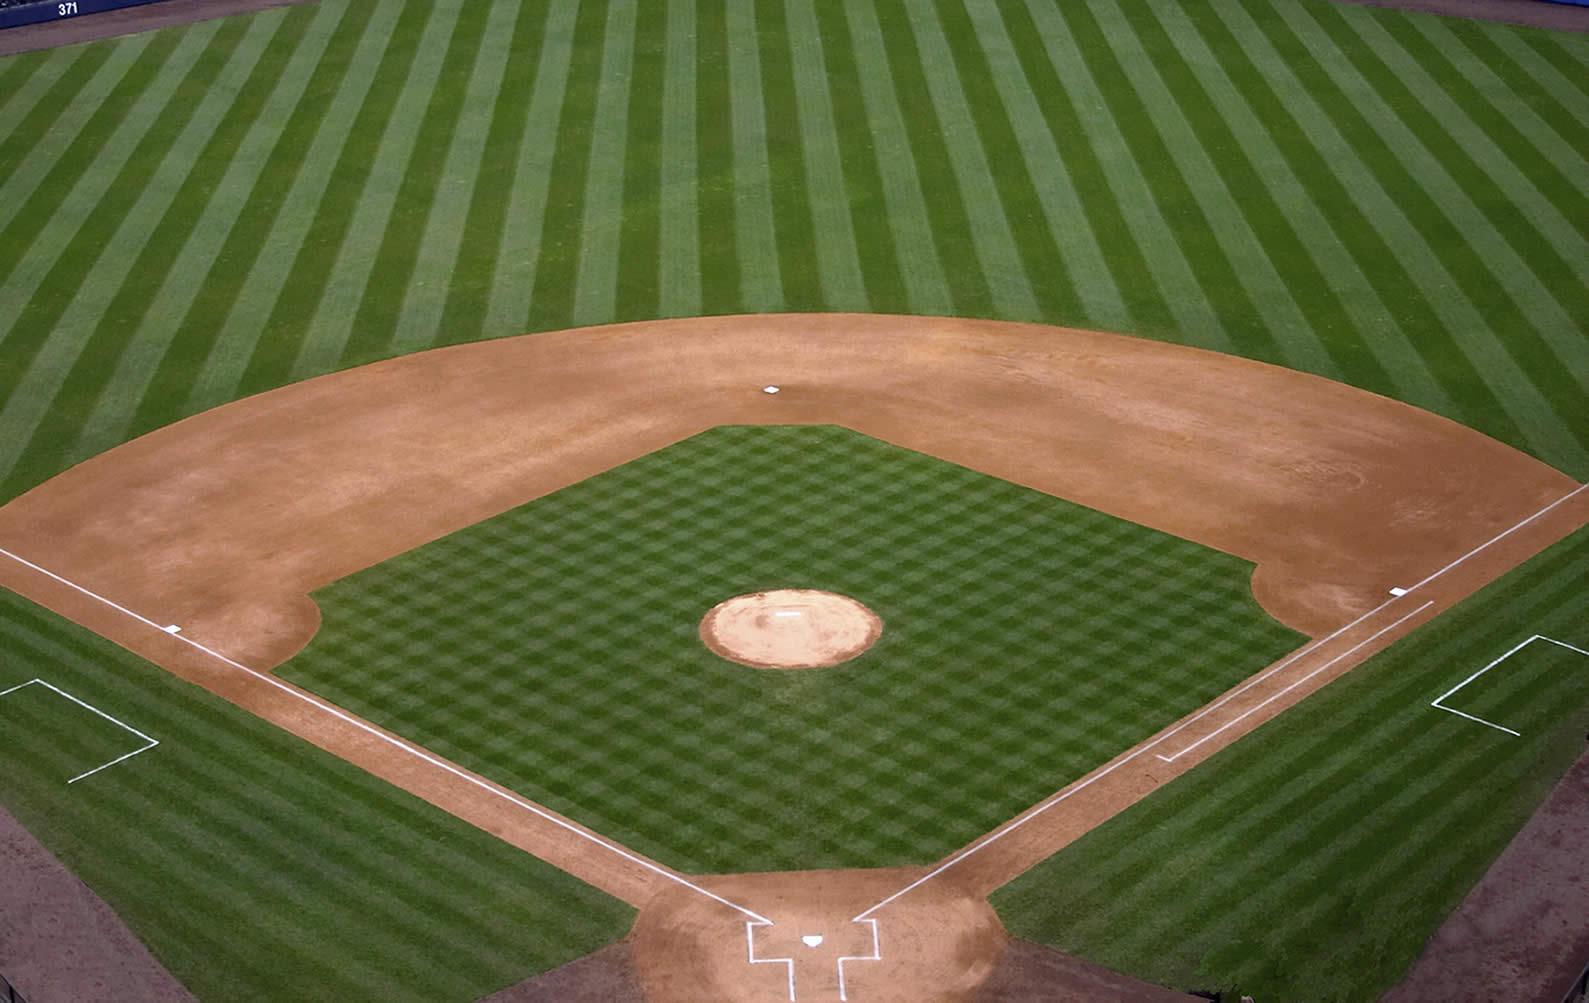 Baseball field baseball diamond clip art related keywords